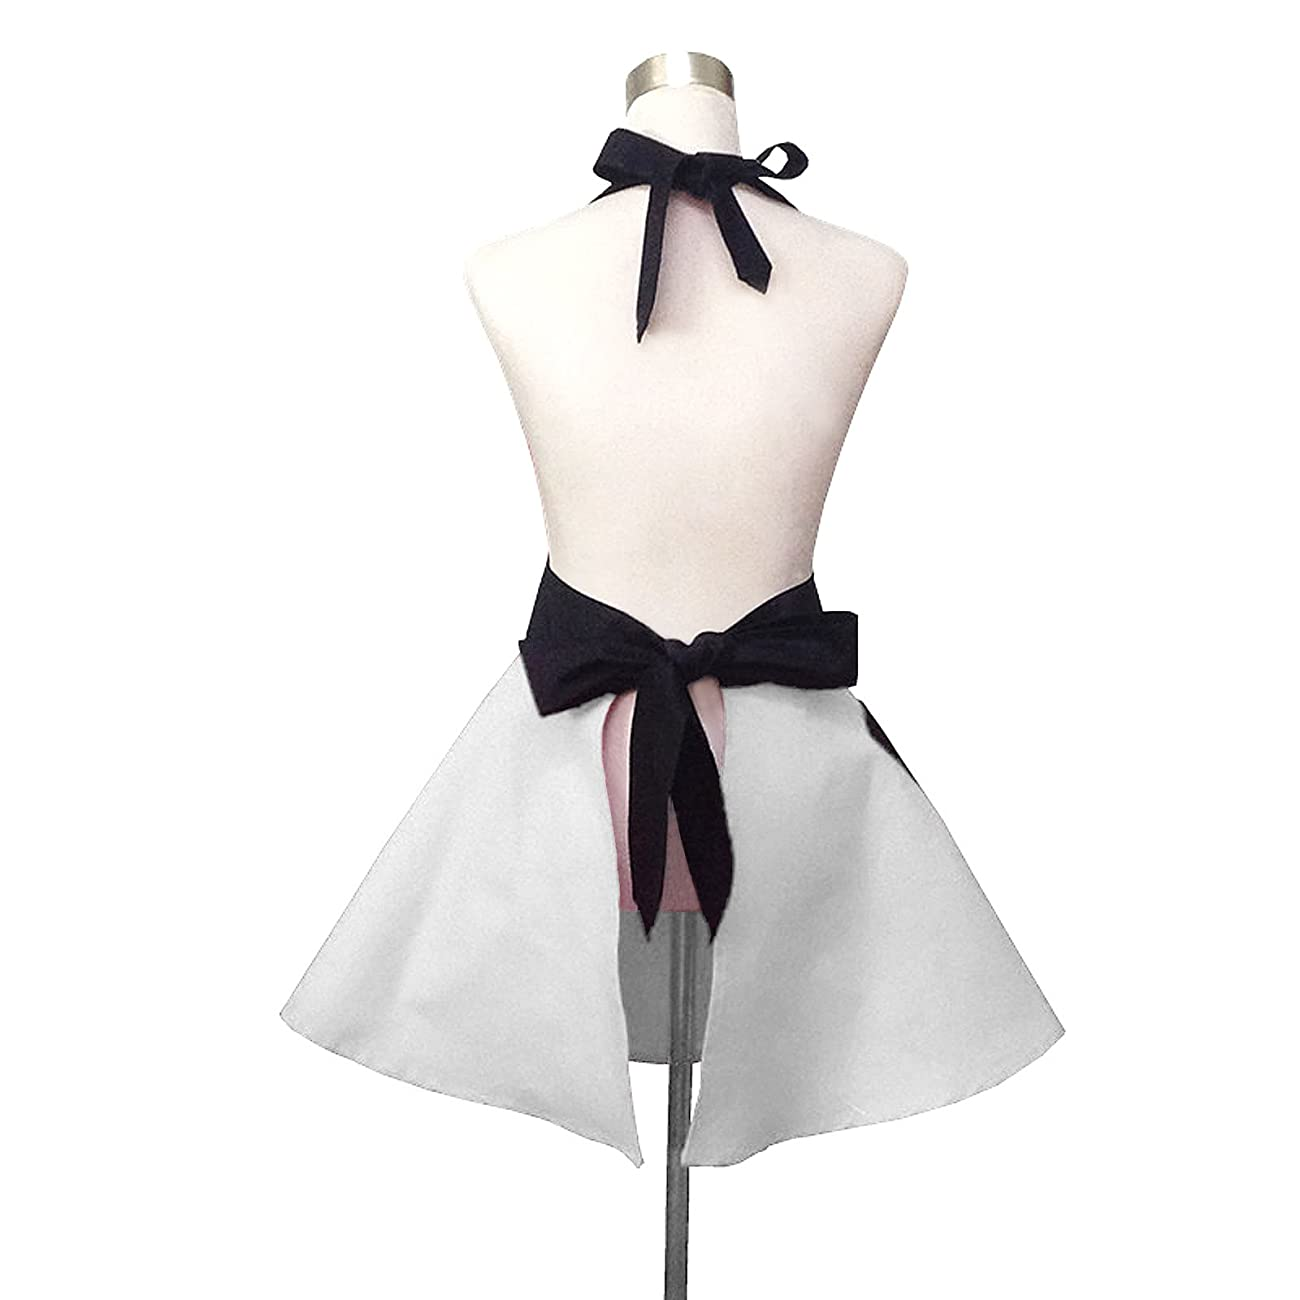 Lovely Hello Kitty White Retro Kitchen Aprons for Woman Girl Cotton Cooking Salon Pinafore Vintage Apron Dress 1